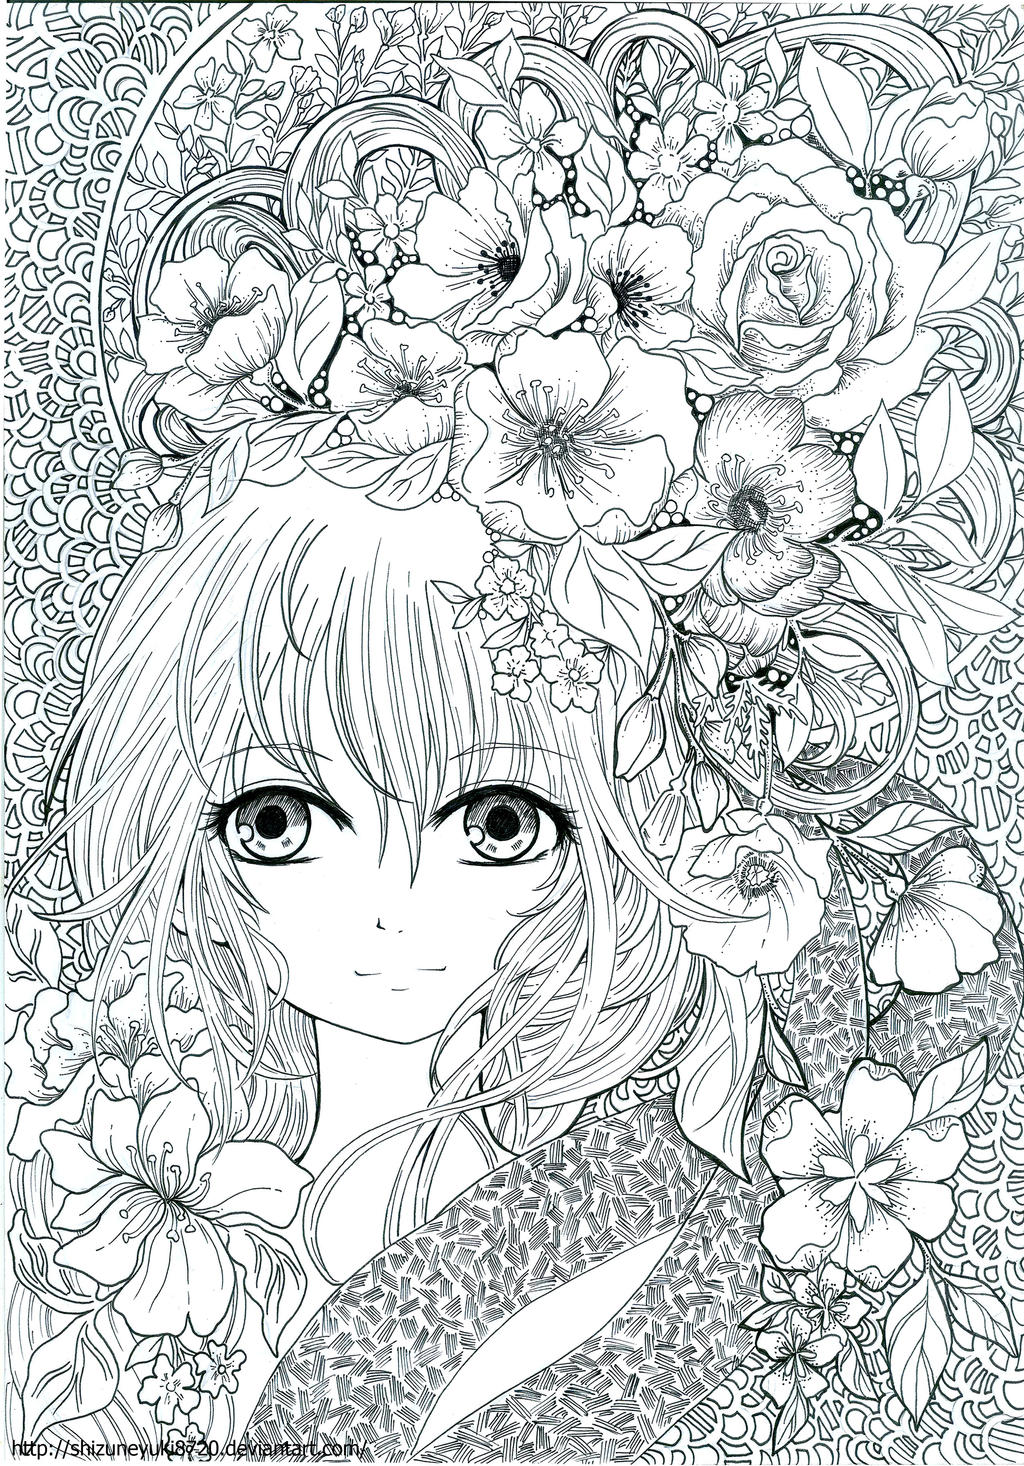 coloring book floral fantasy page 20 by shizuneyuki8720